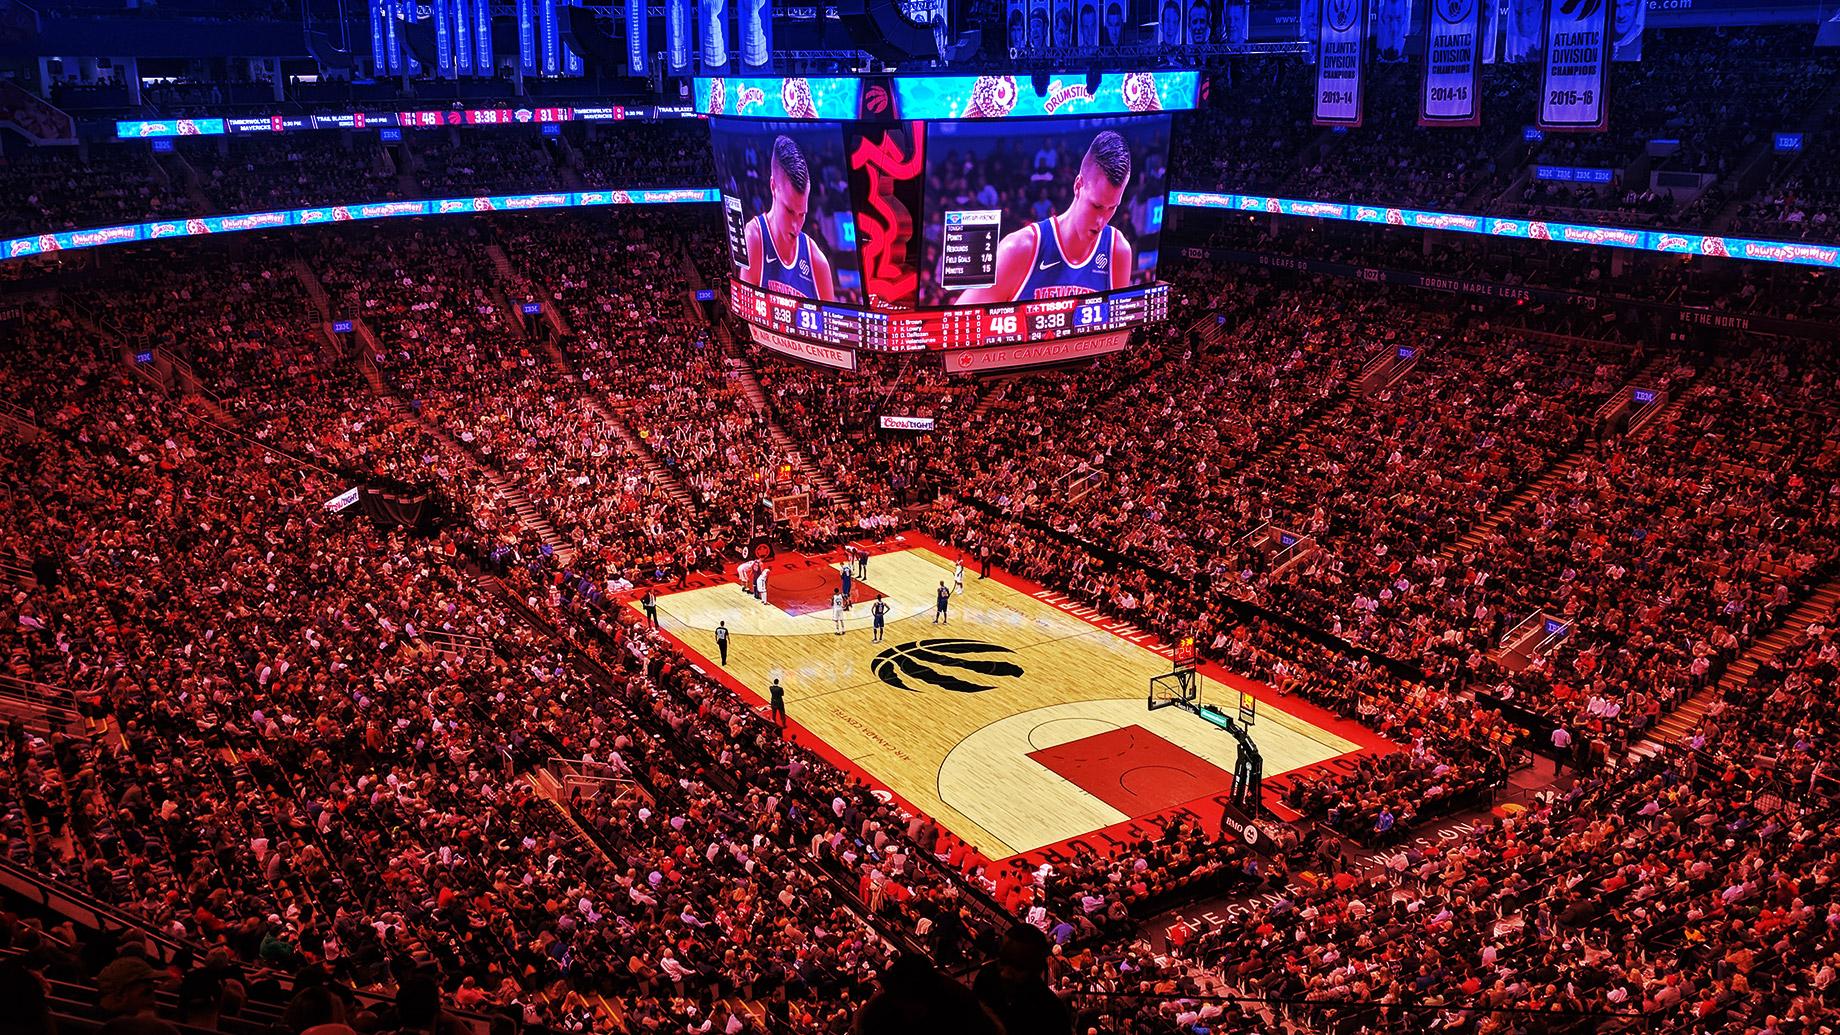 Raptors NBA Basketball - Toronto, Ontario, Canada